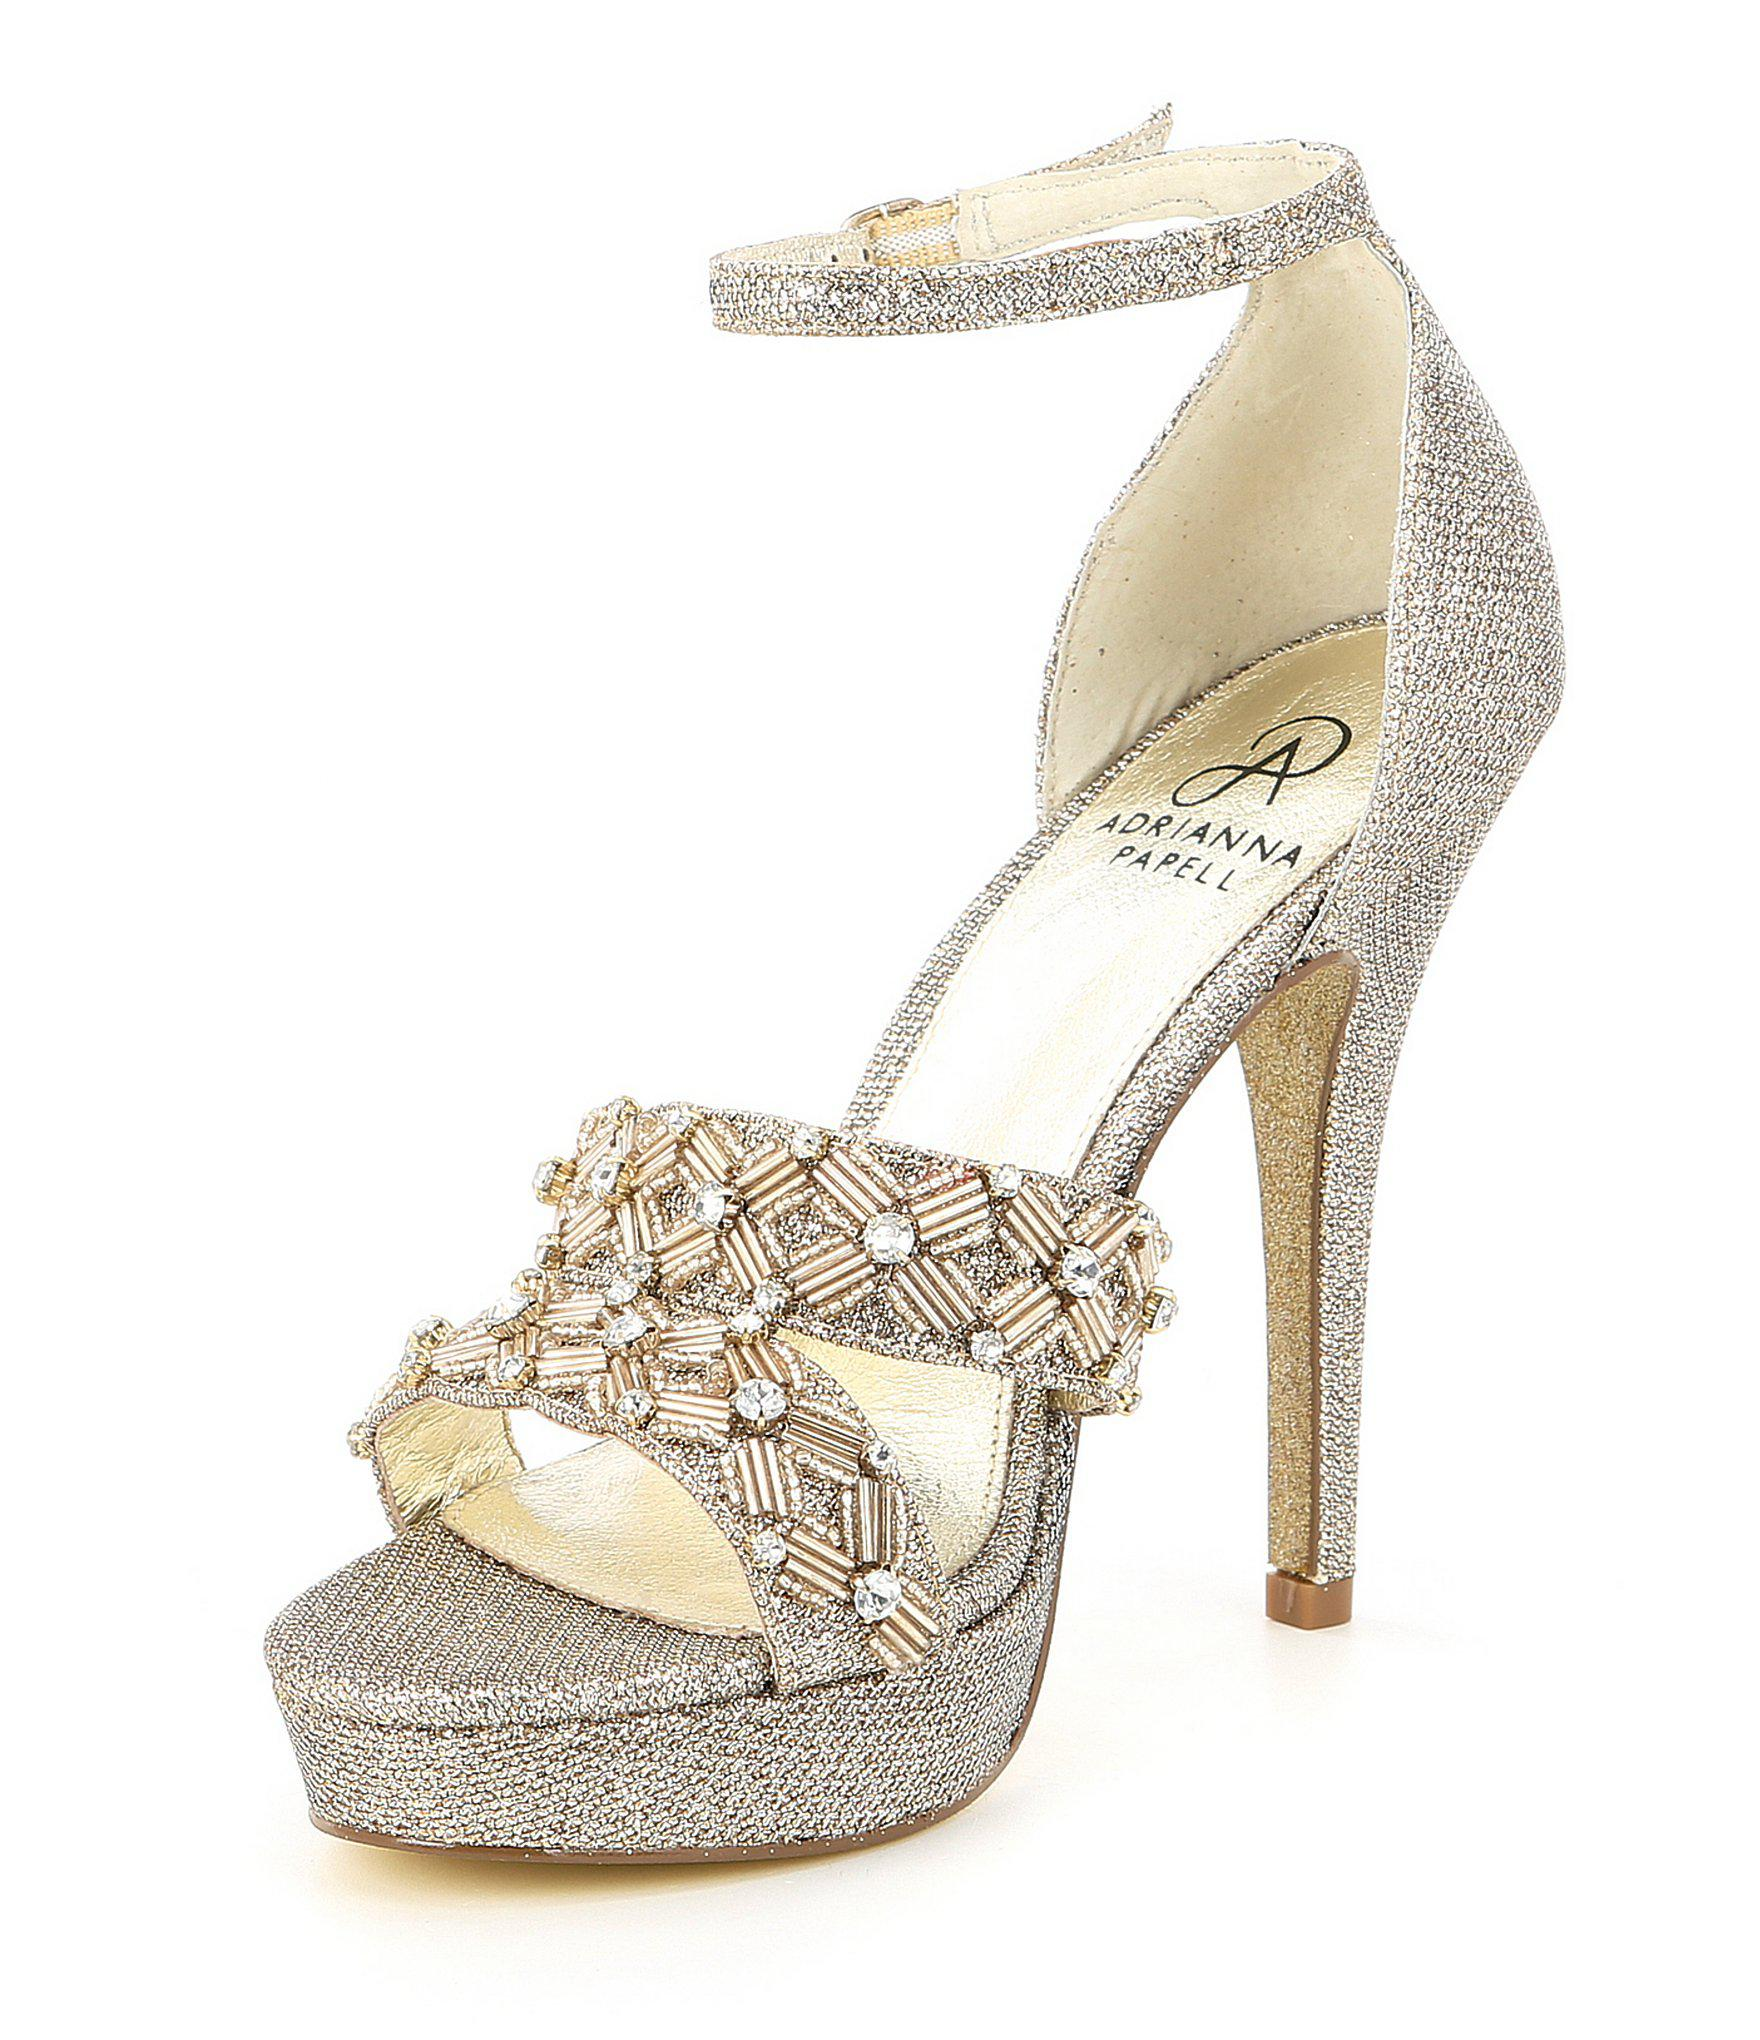 d4c295bd785 Adrianna Papell Marietta Metallic Jeweled Ankle Strap Platform Dress Sandals